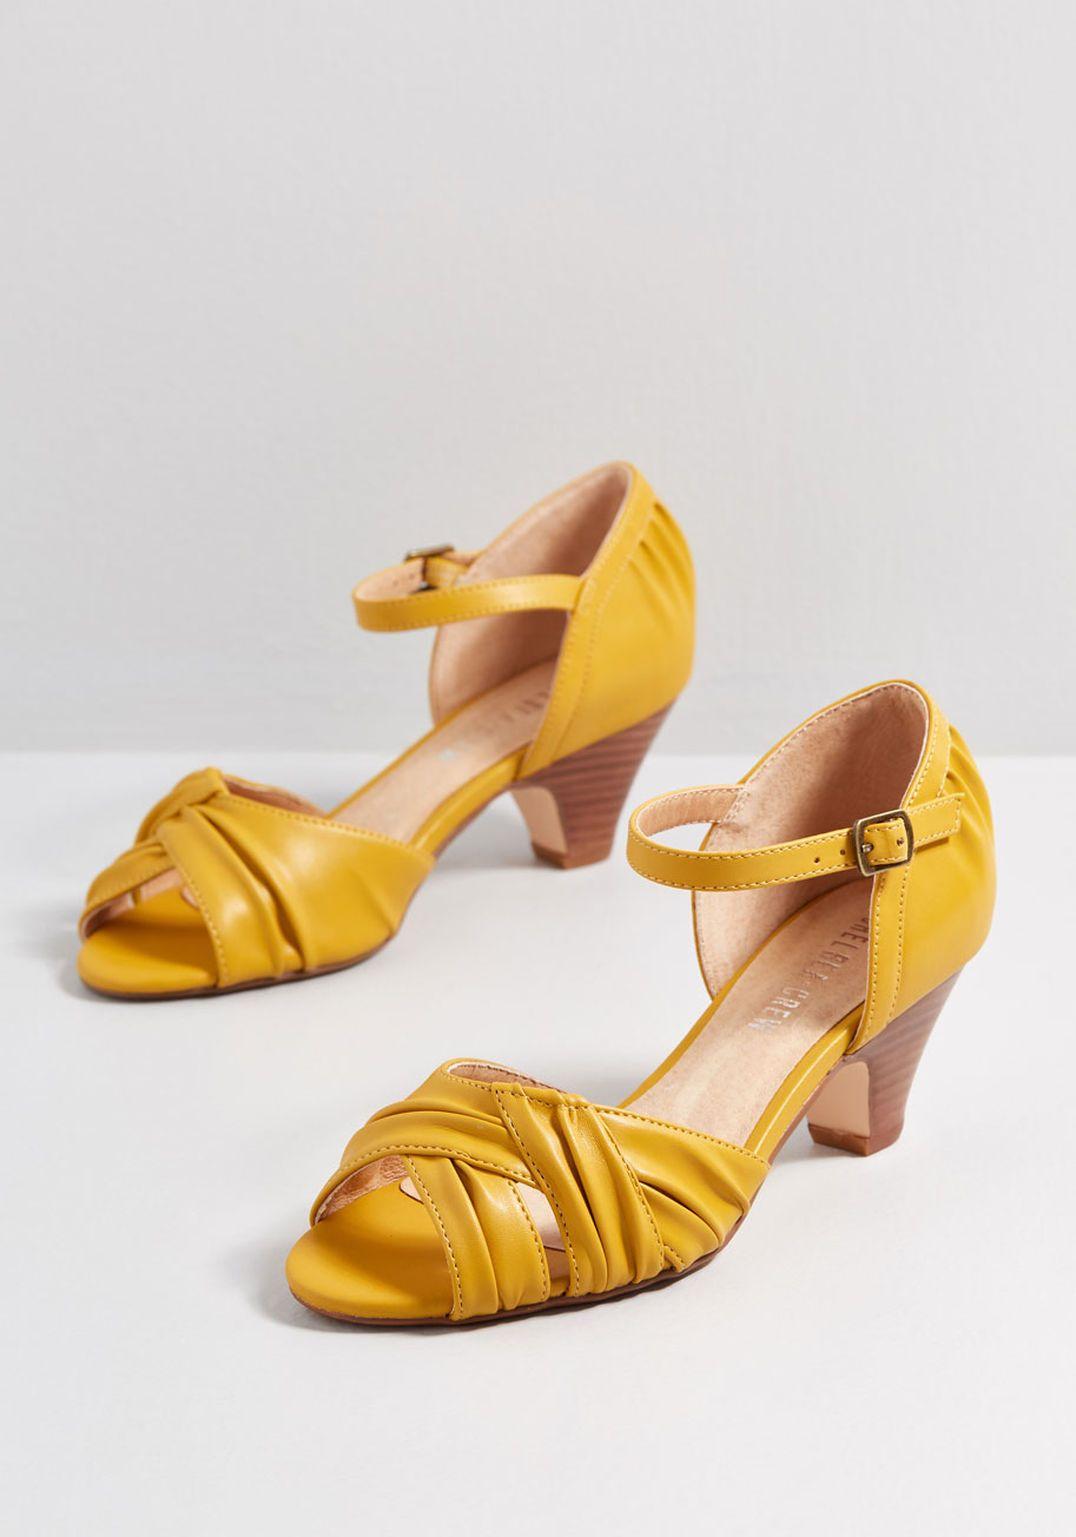 46316d91860 Makin' Moves Mid-Height Heel in 2019   Fashion   Mustard yellow ...